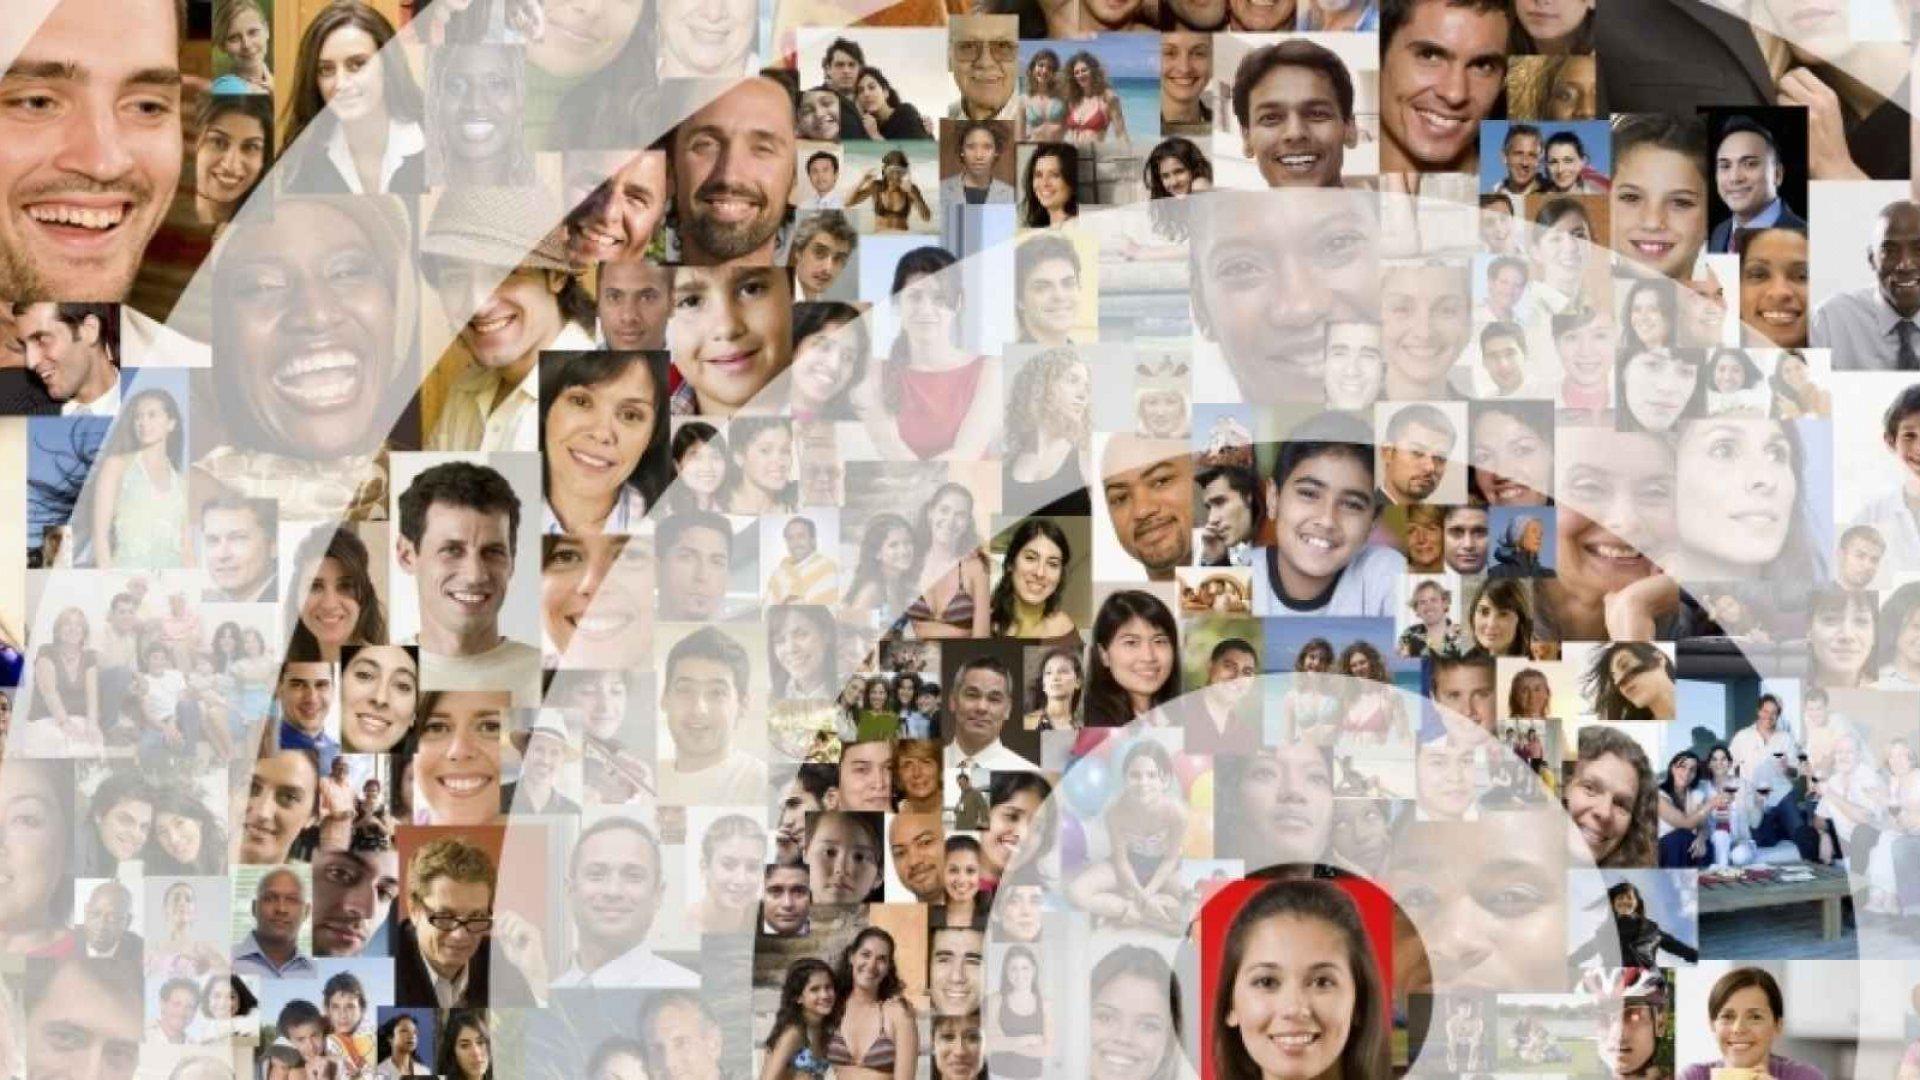 Improving Company Culture Through Feedback and Follow-Through